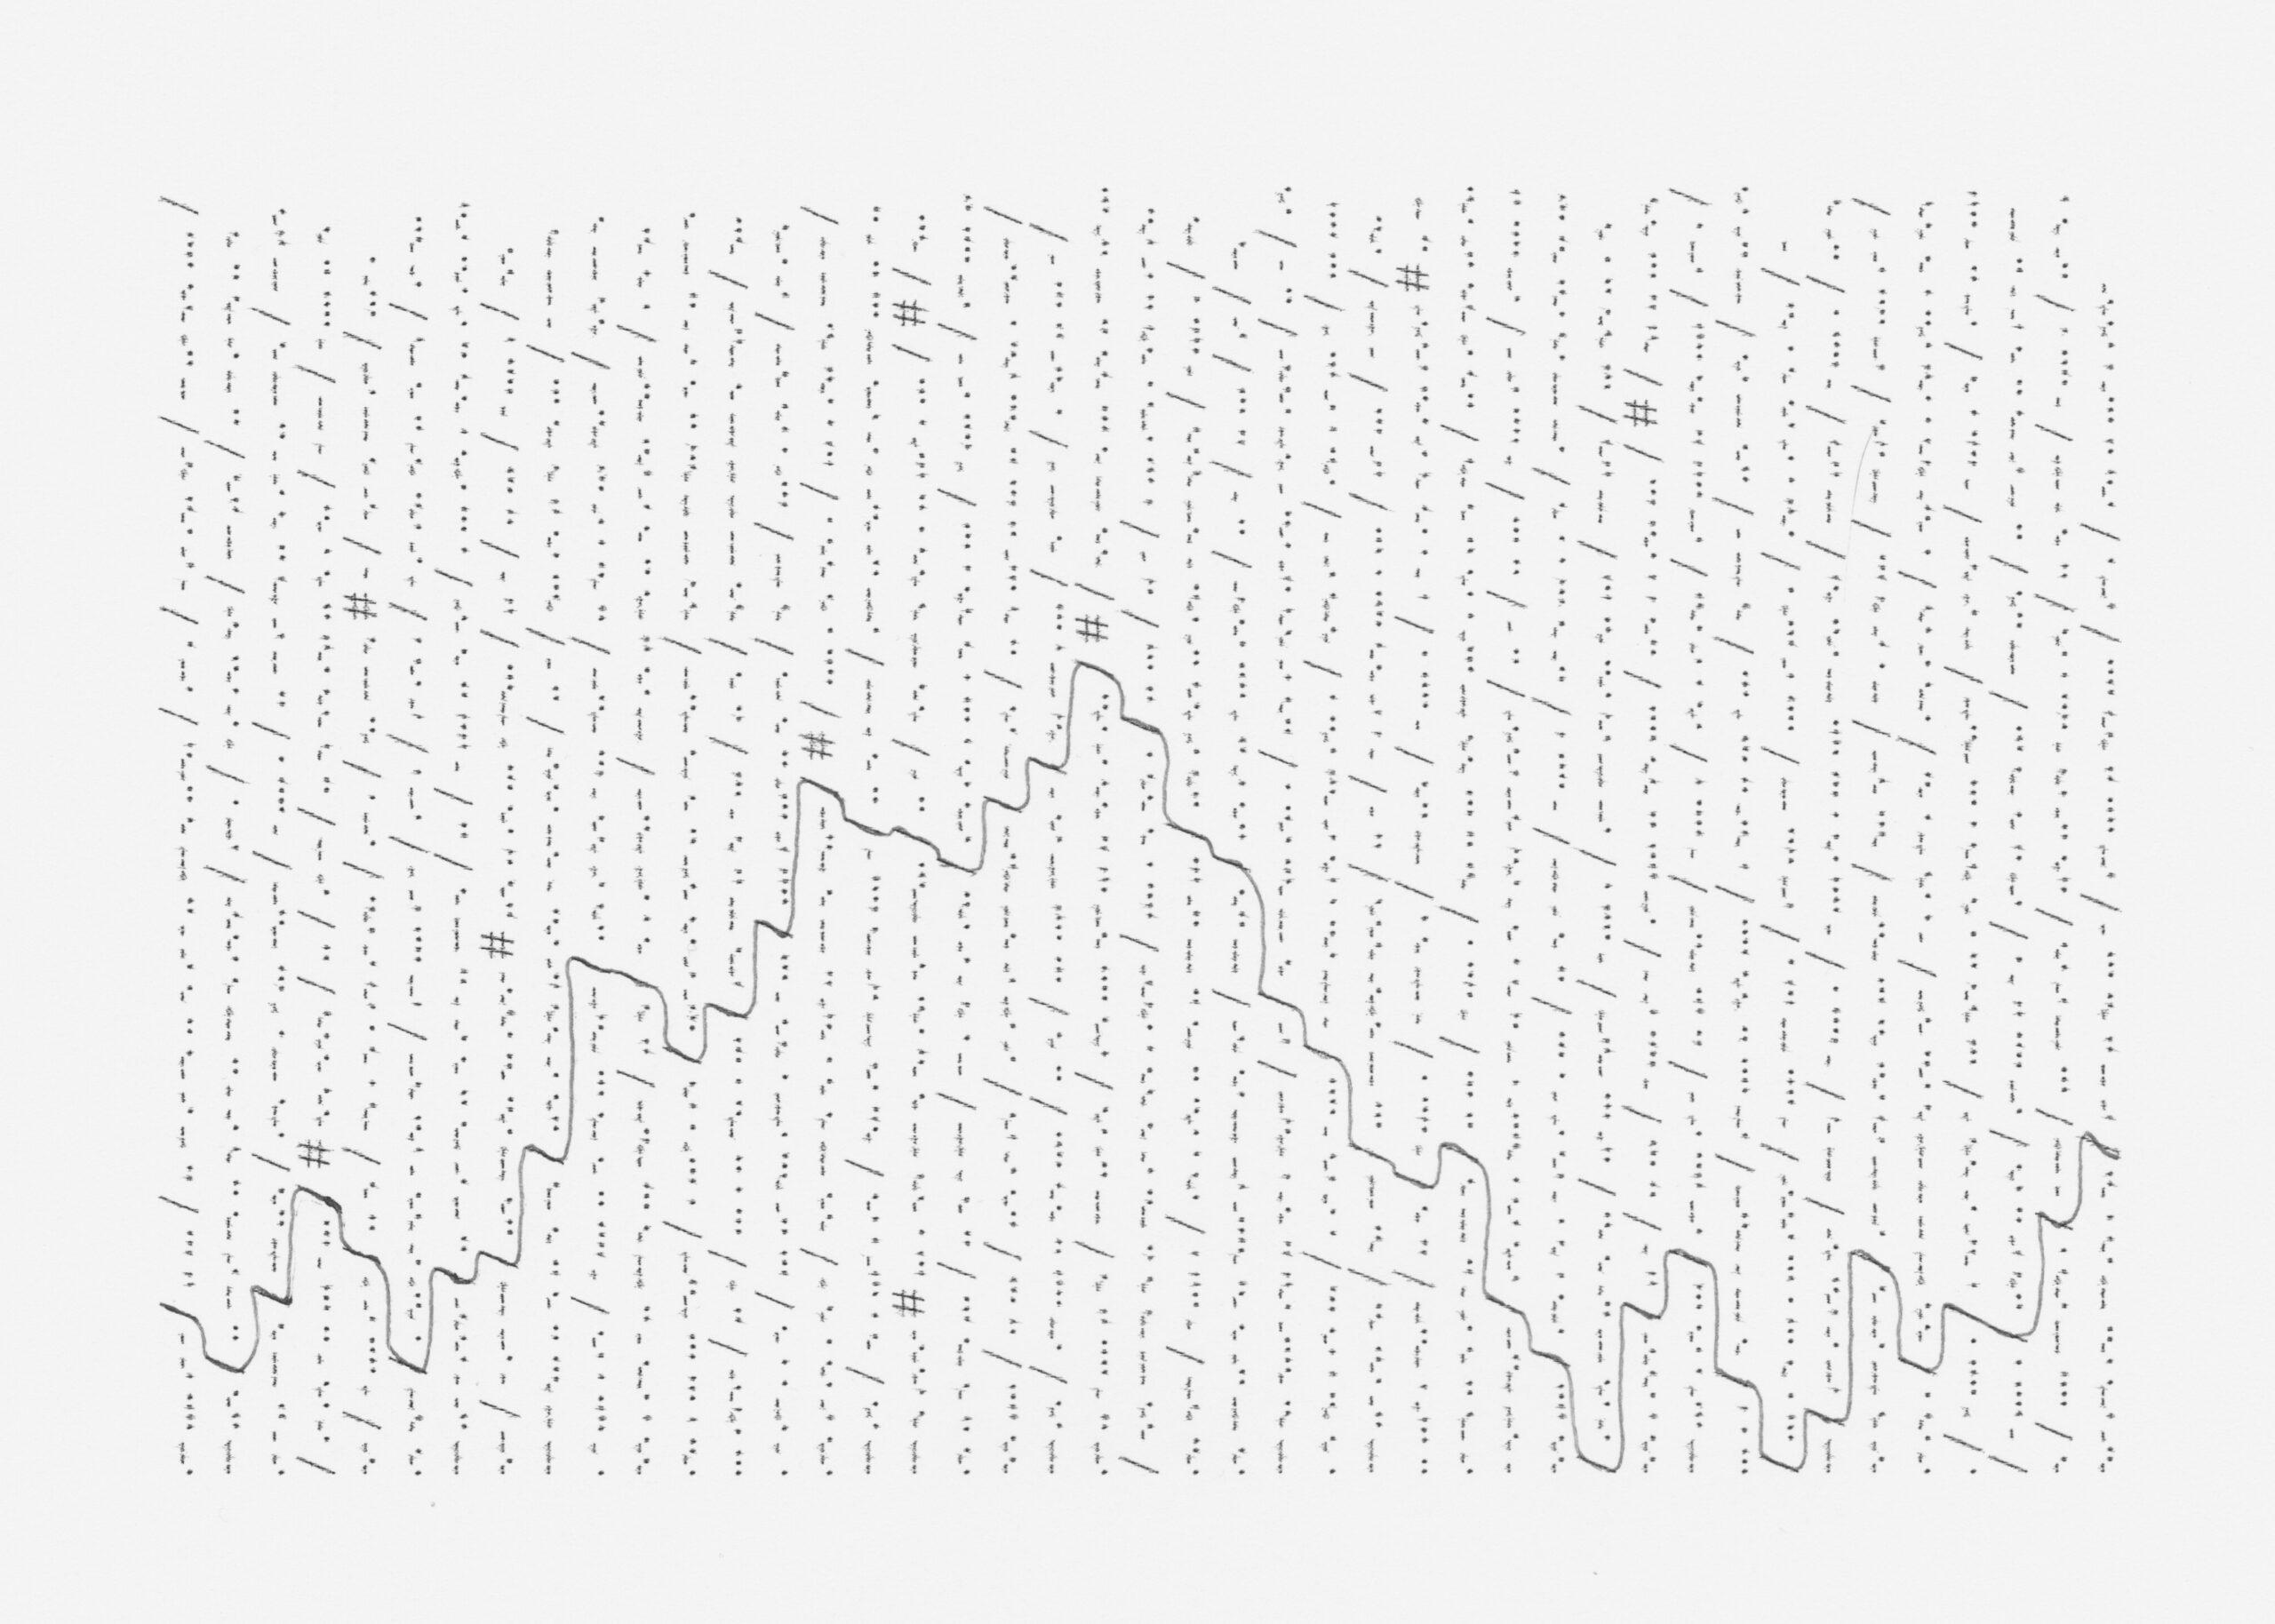 A_2020_04_23_scans_total_morseknittingScan-18